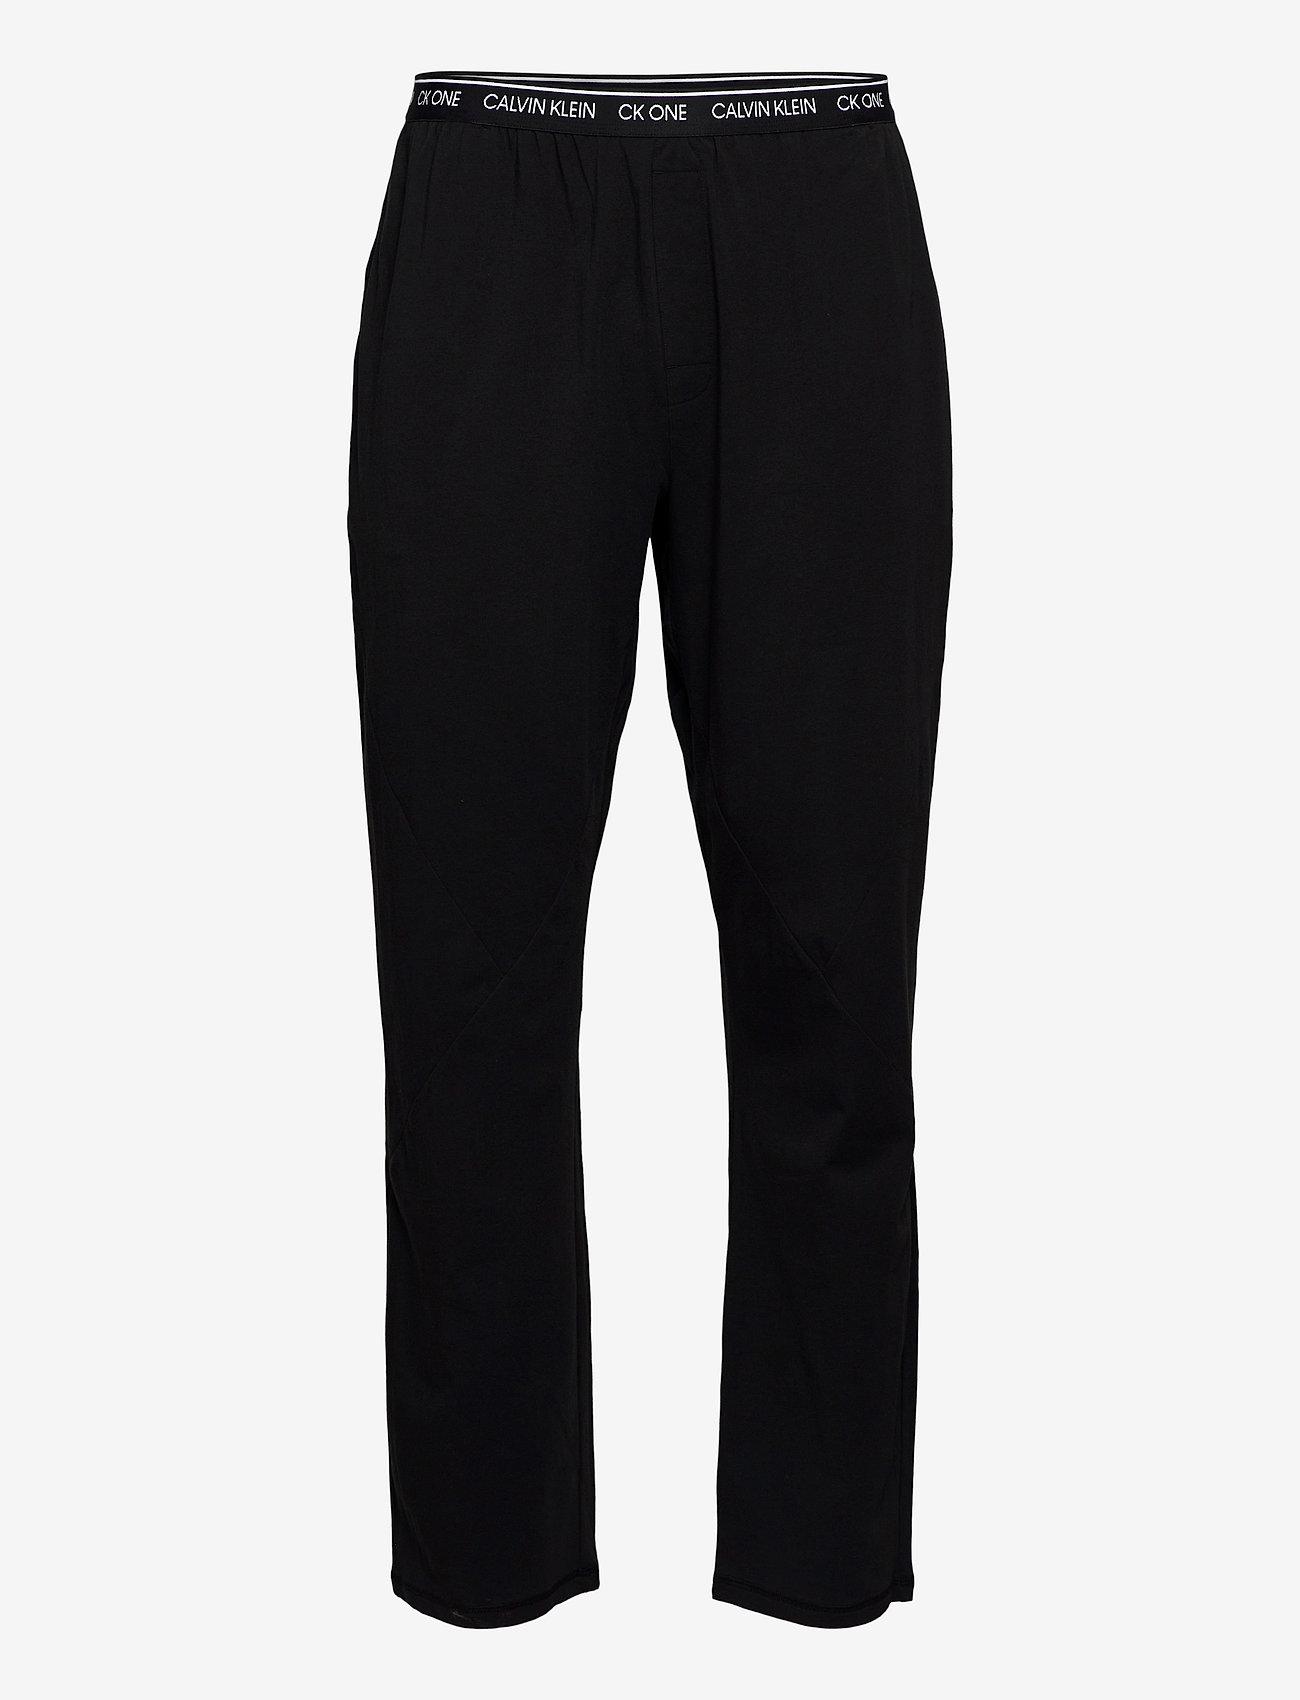 Calvin Klein - SLEEP PANT - bottoms - black - 0